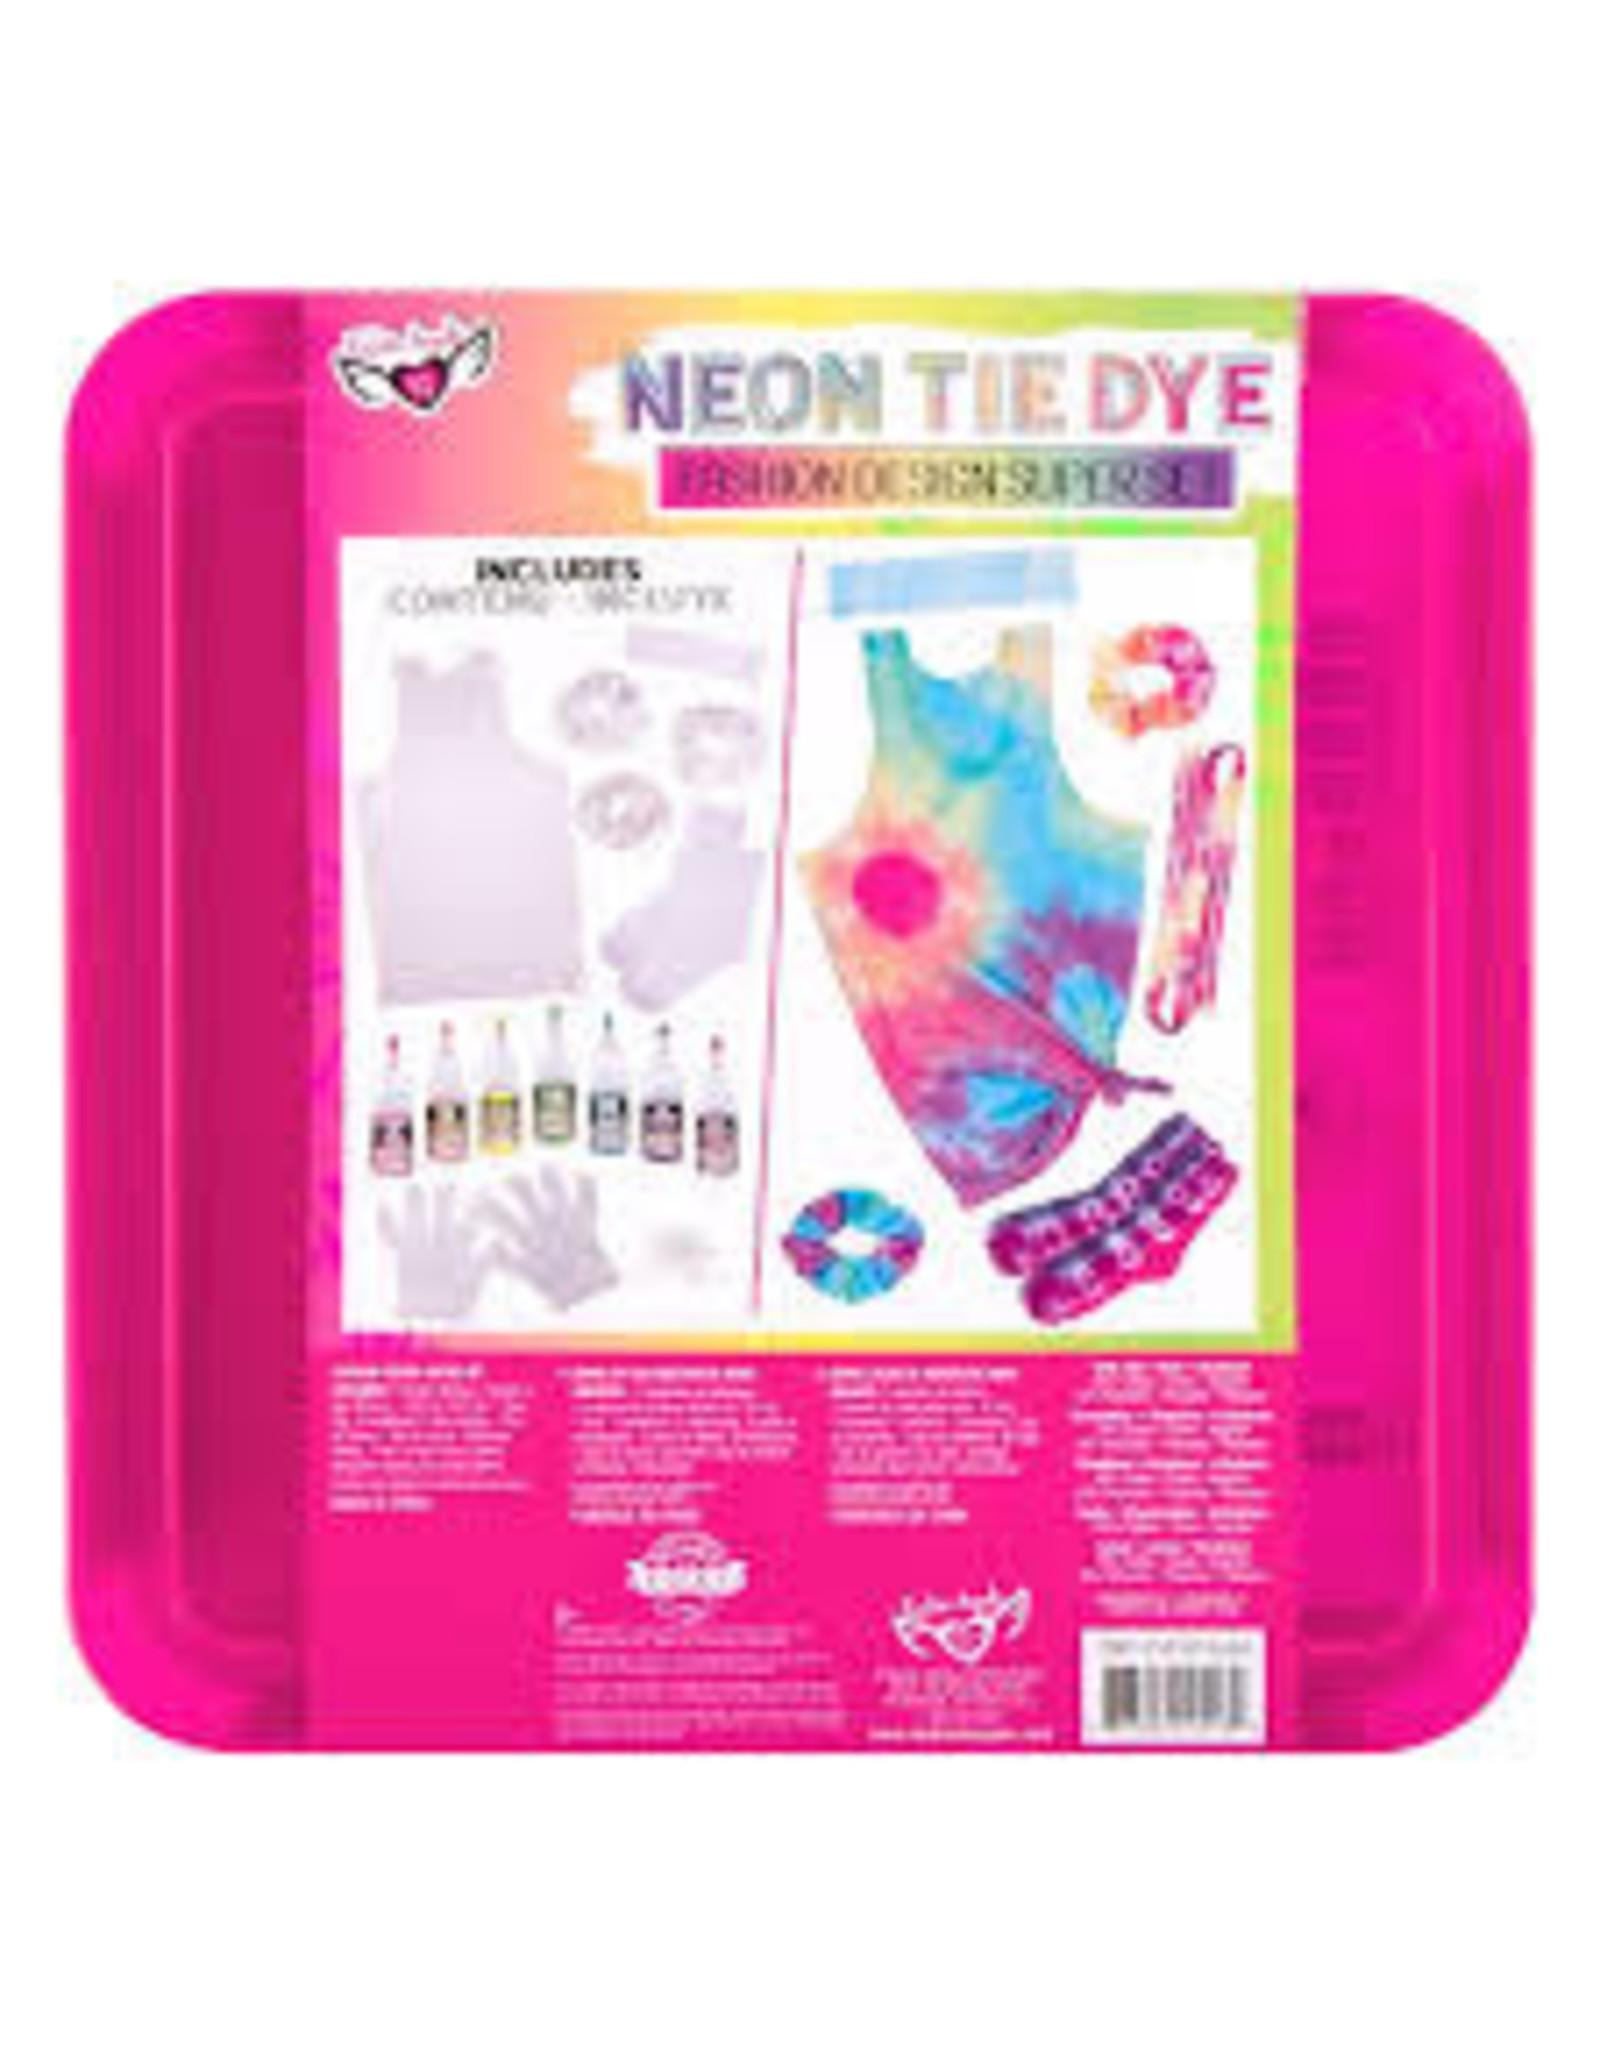 Fashion Angels Neon Tie Dye Fashion Design Super Set